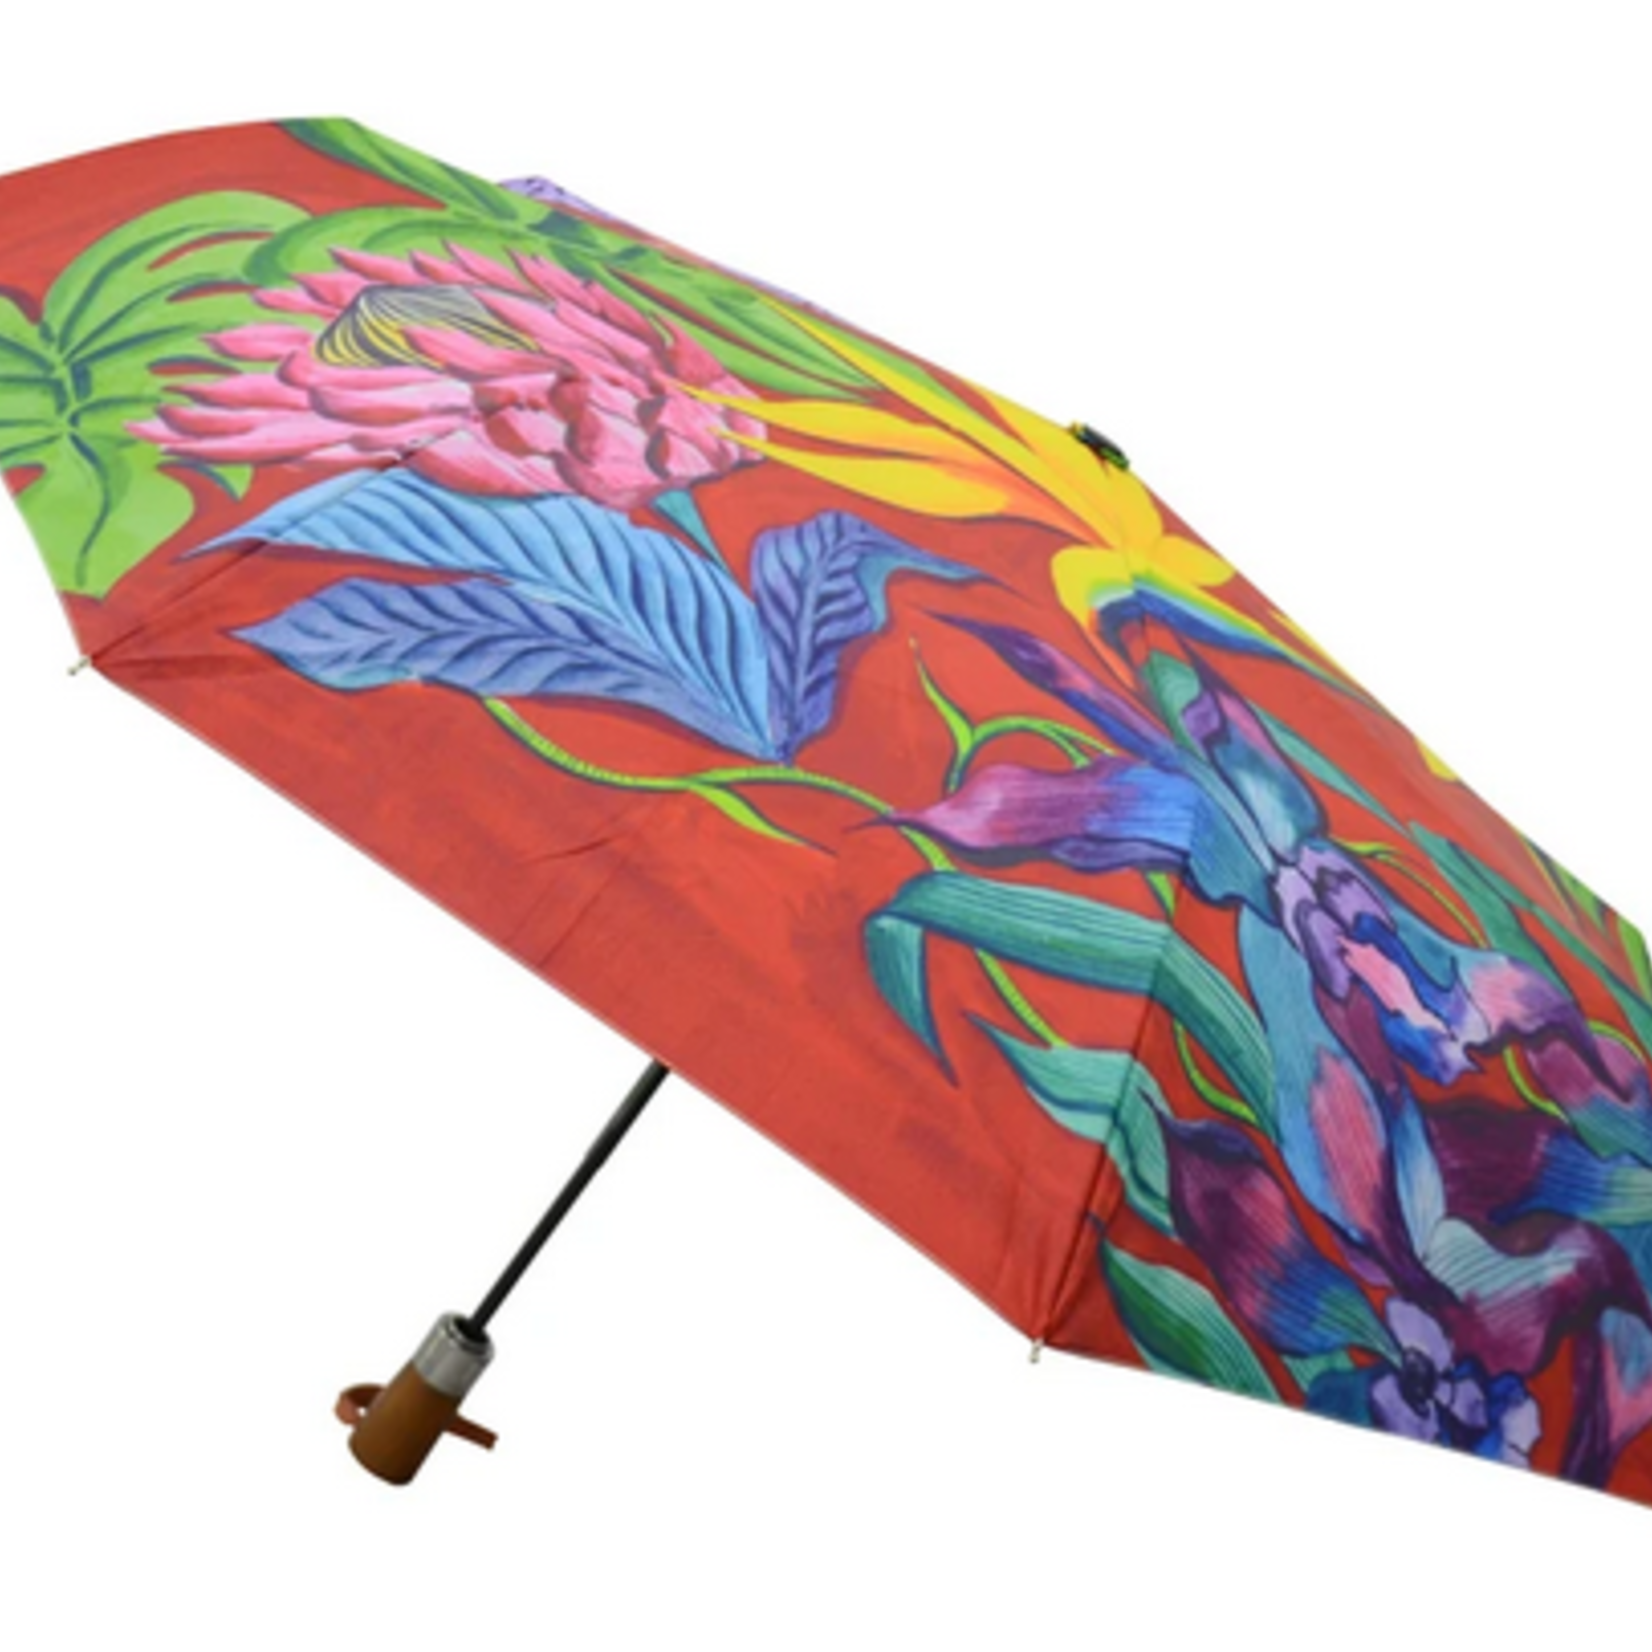 Anuschka 3100 ise umbrella